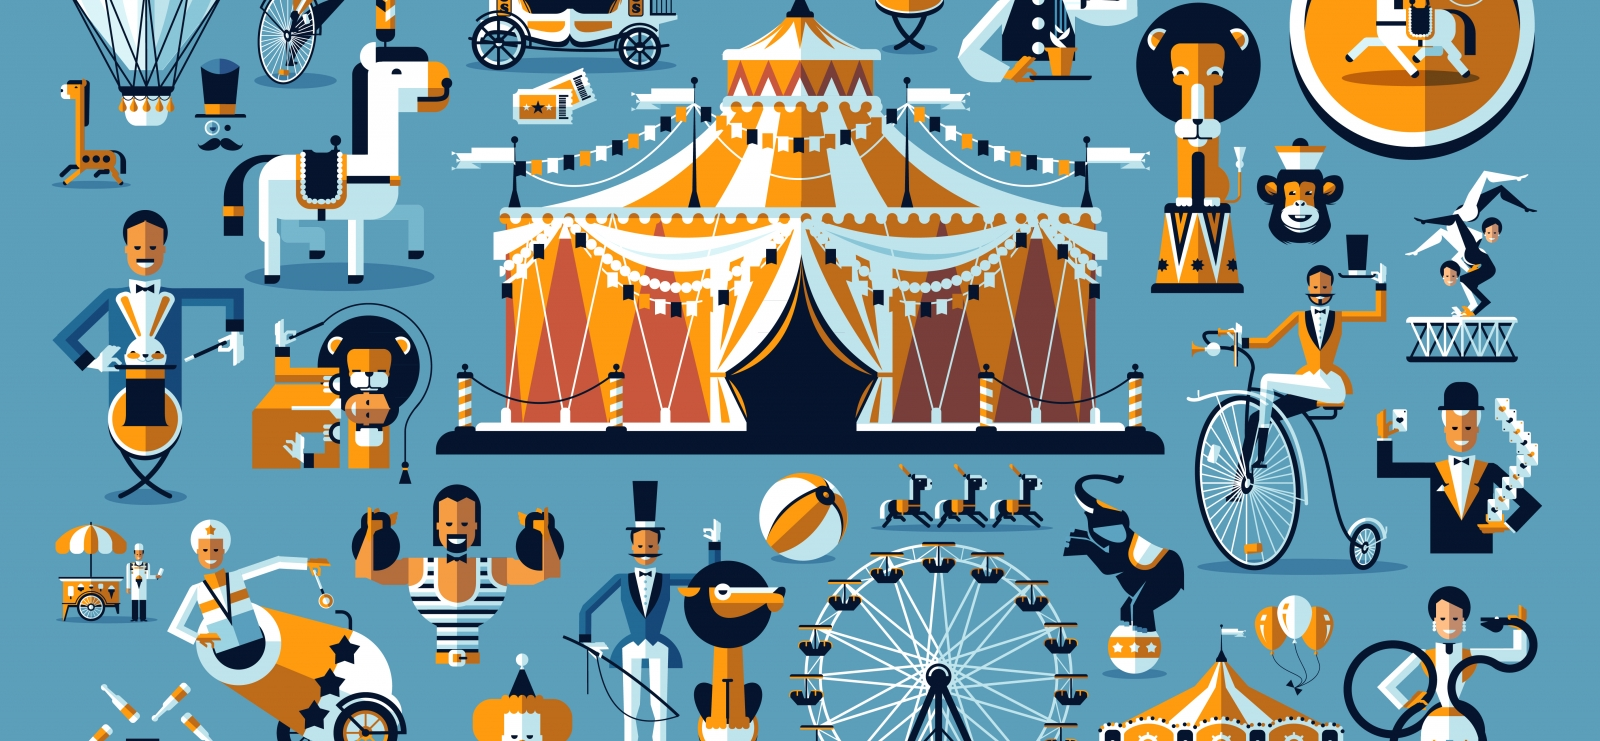 Summer circus show